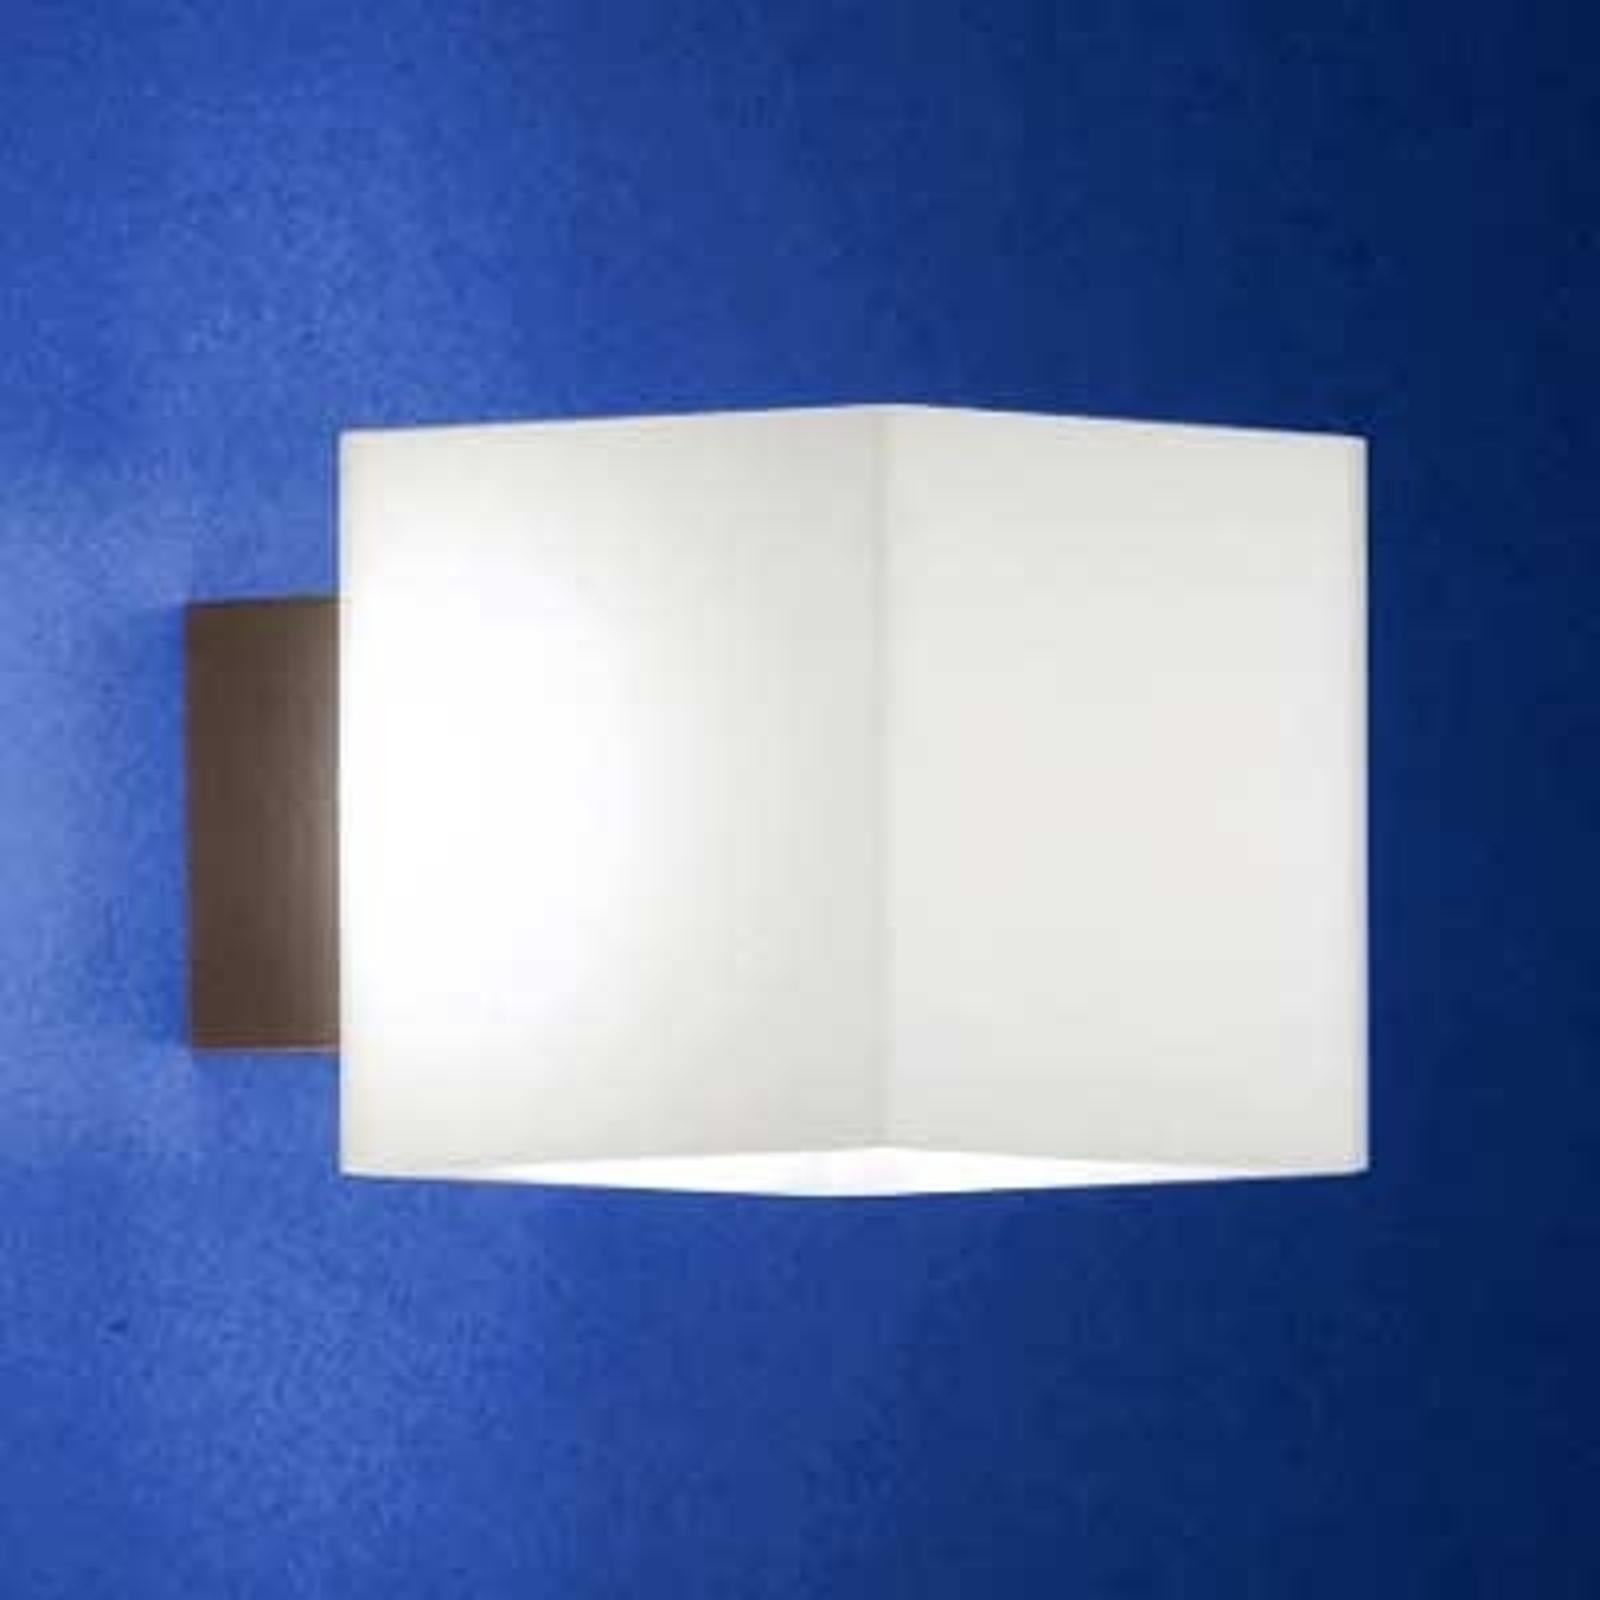 Wandlamp CUBE, niet-verblindend